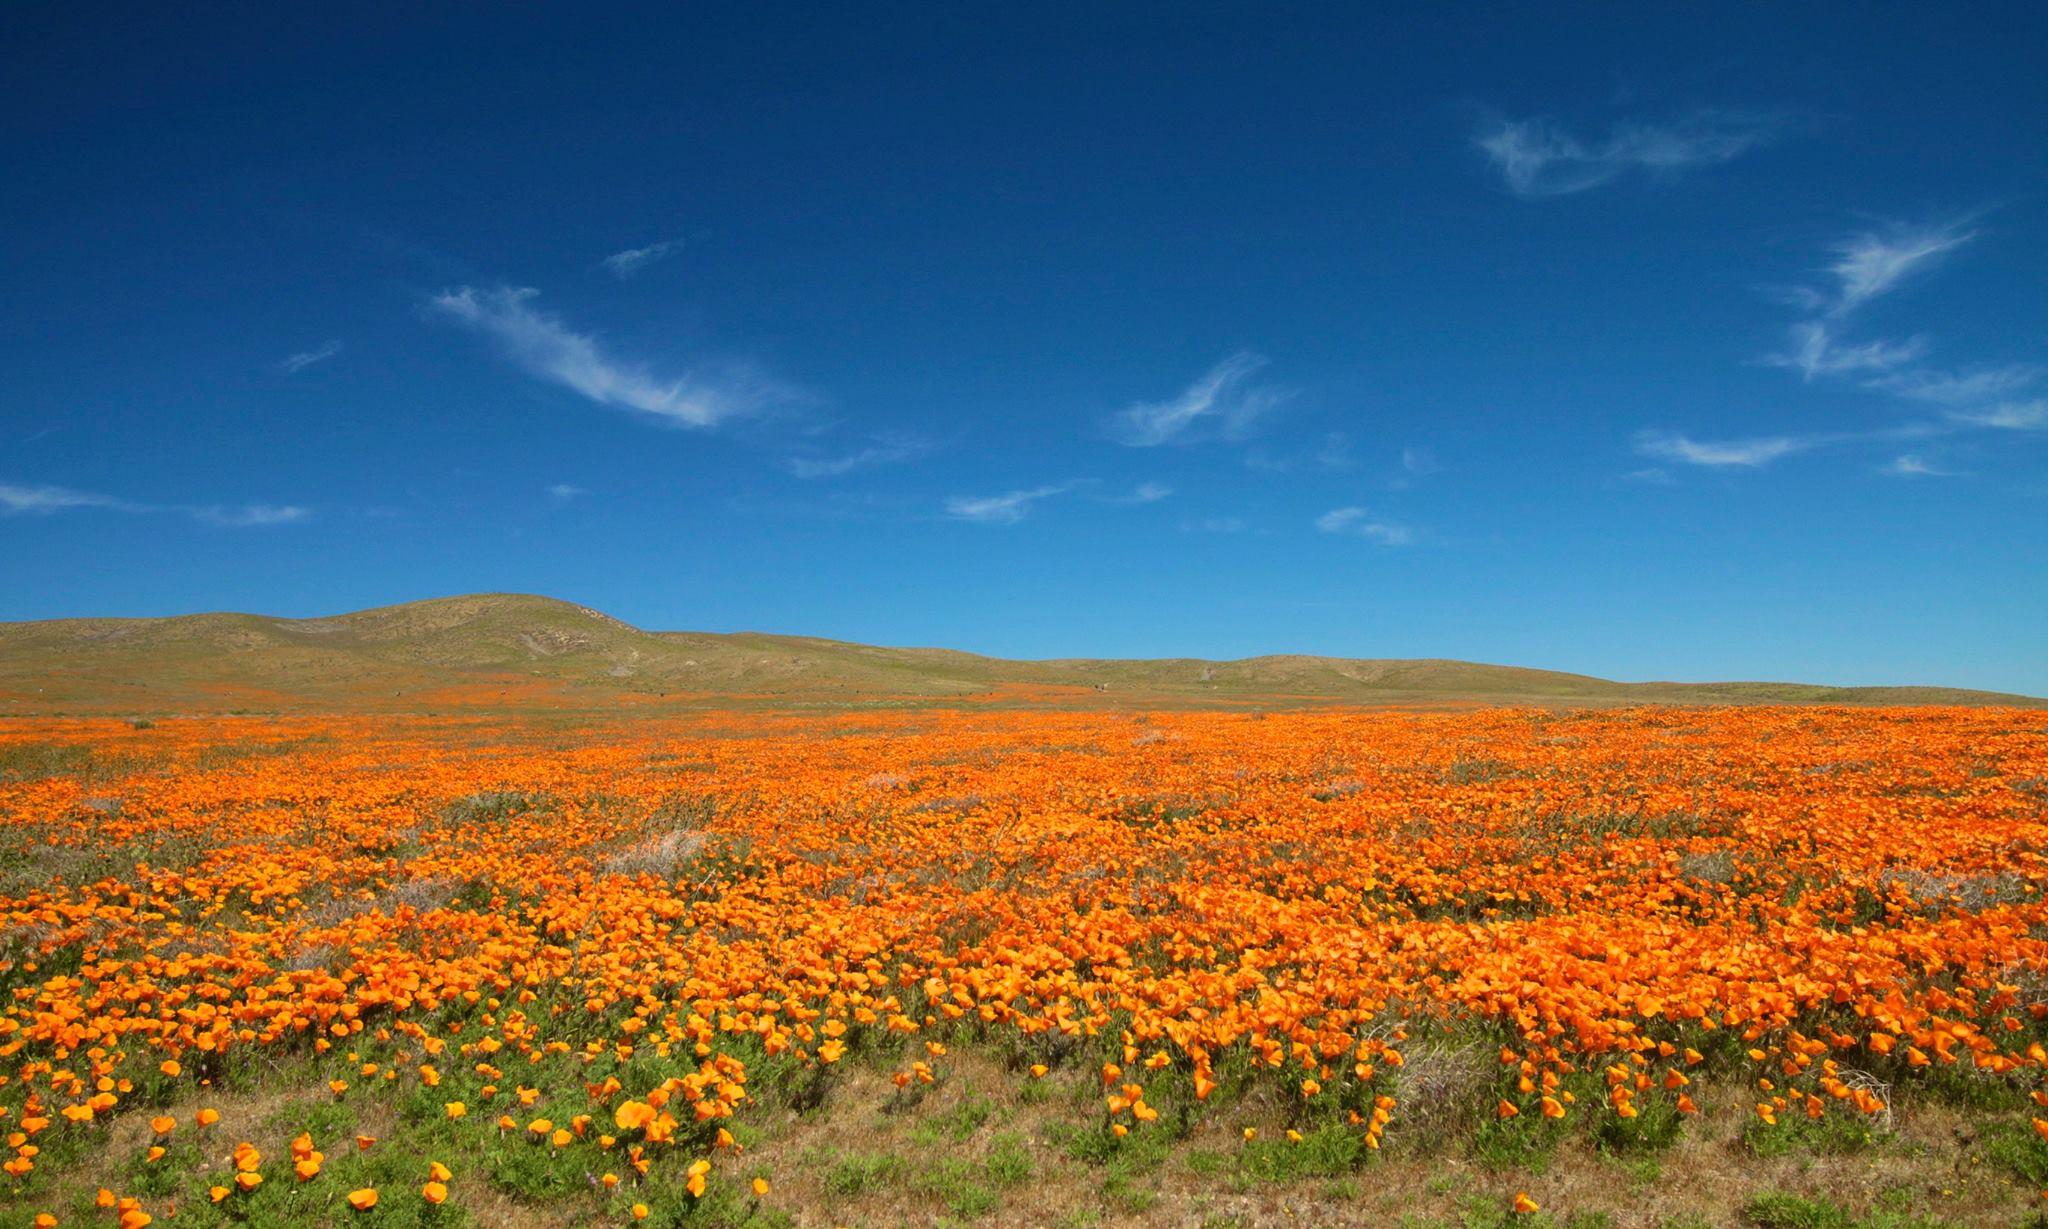 California Poppy Reserve in mid-April 2017 (Photo Credit: Joe Longo)